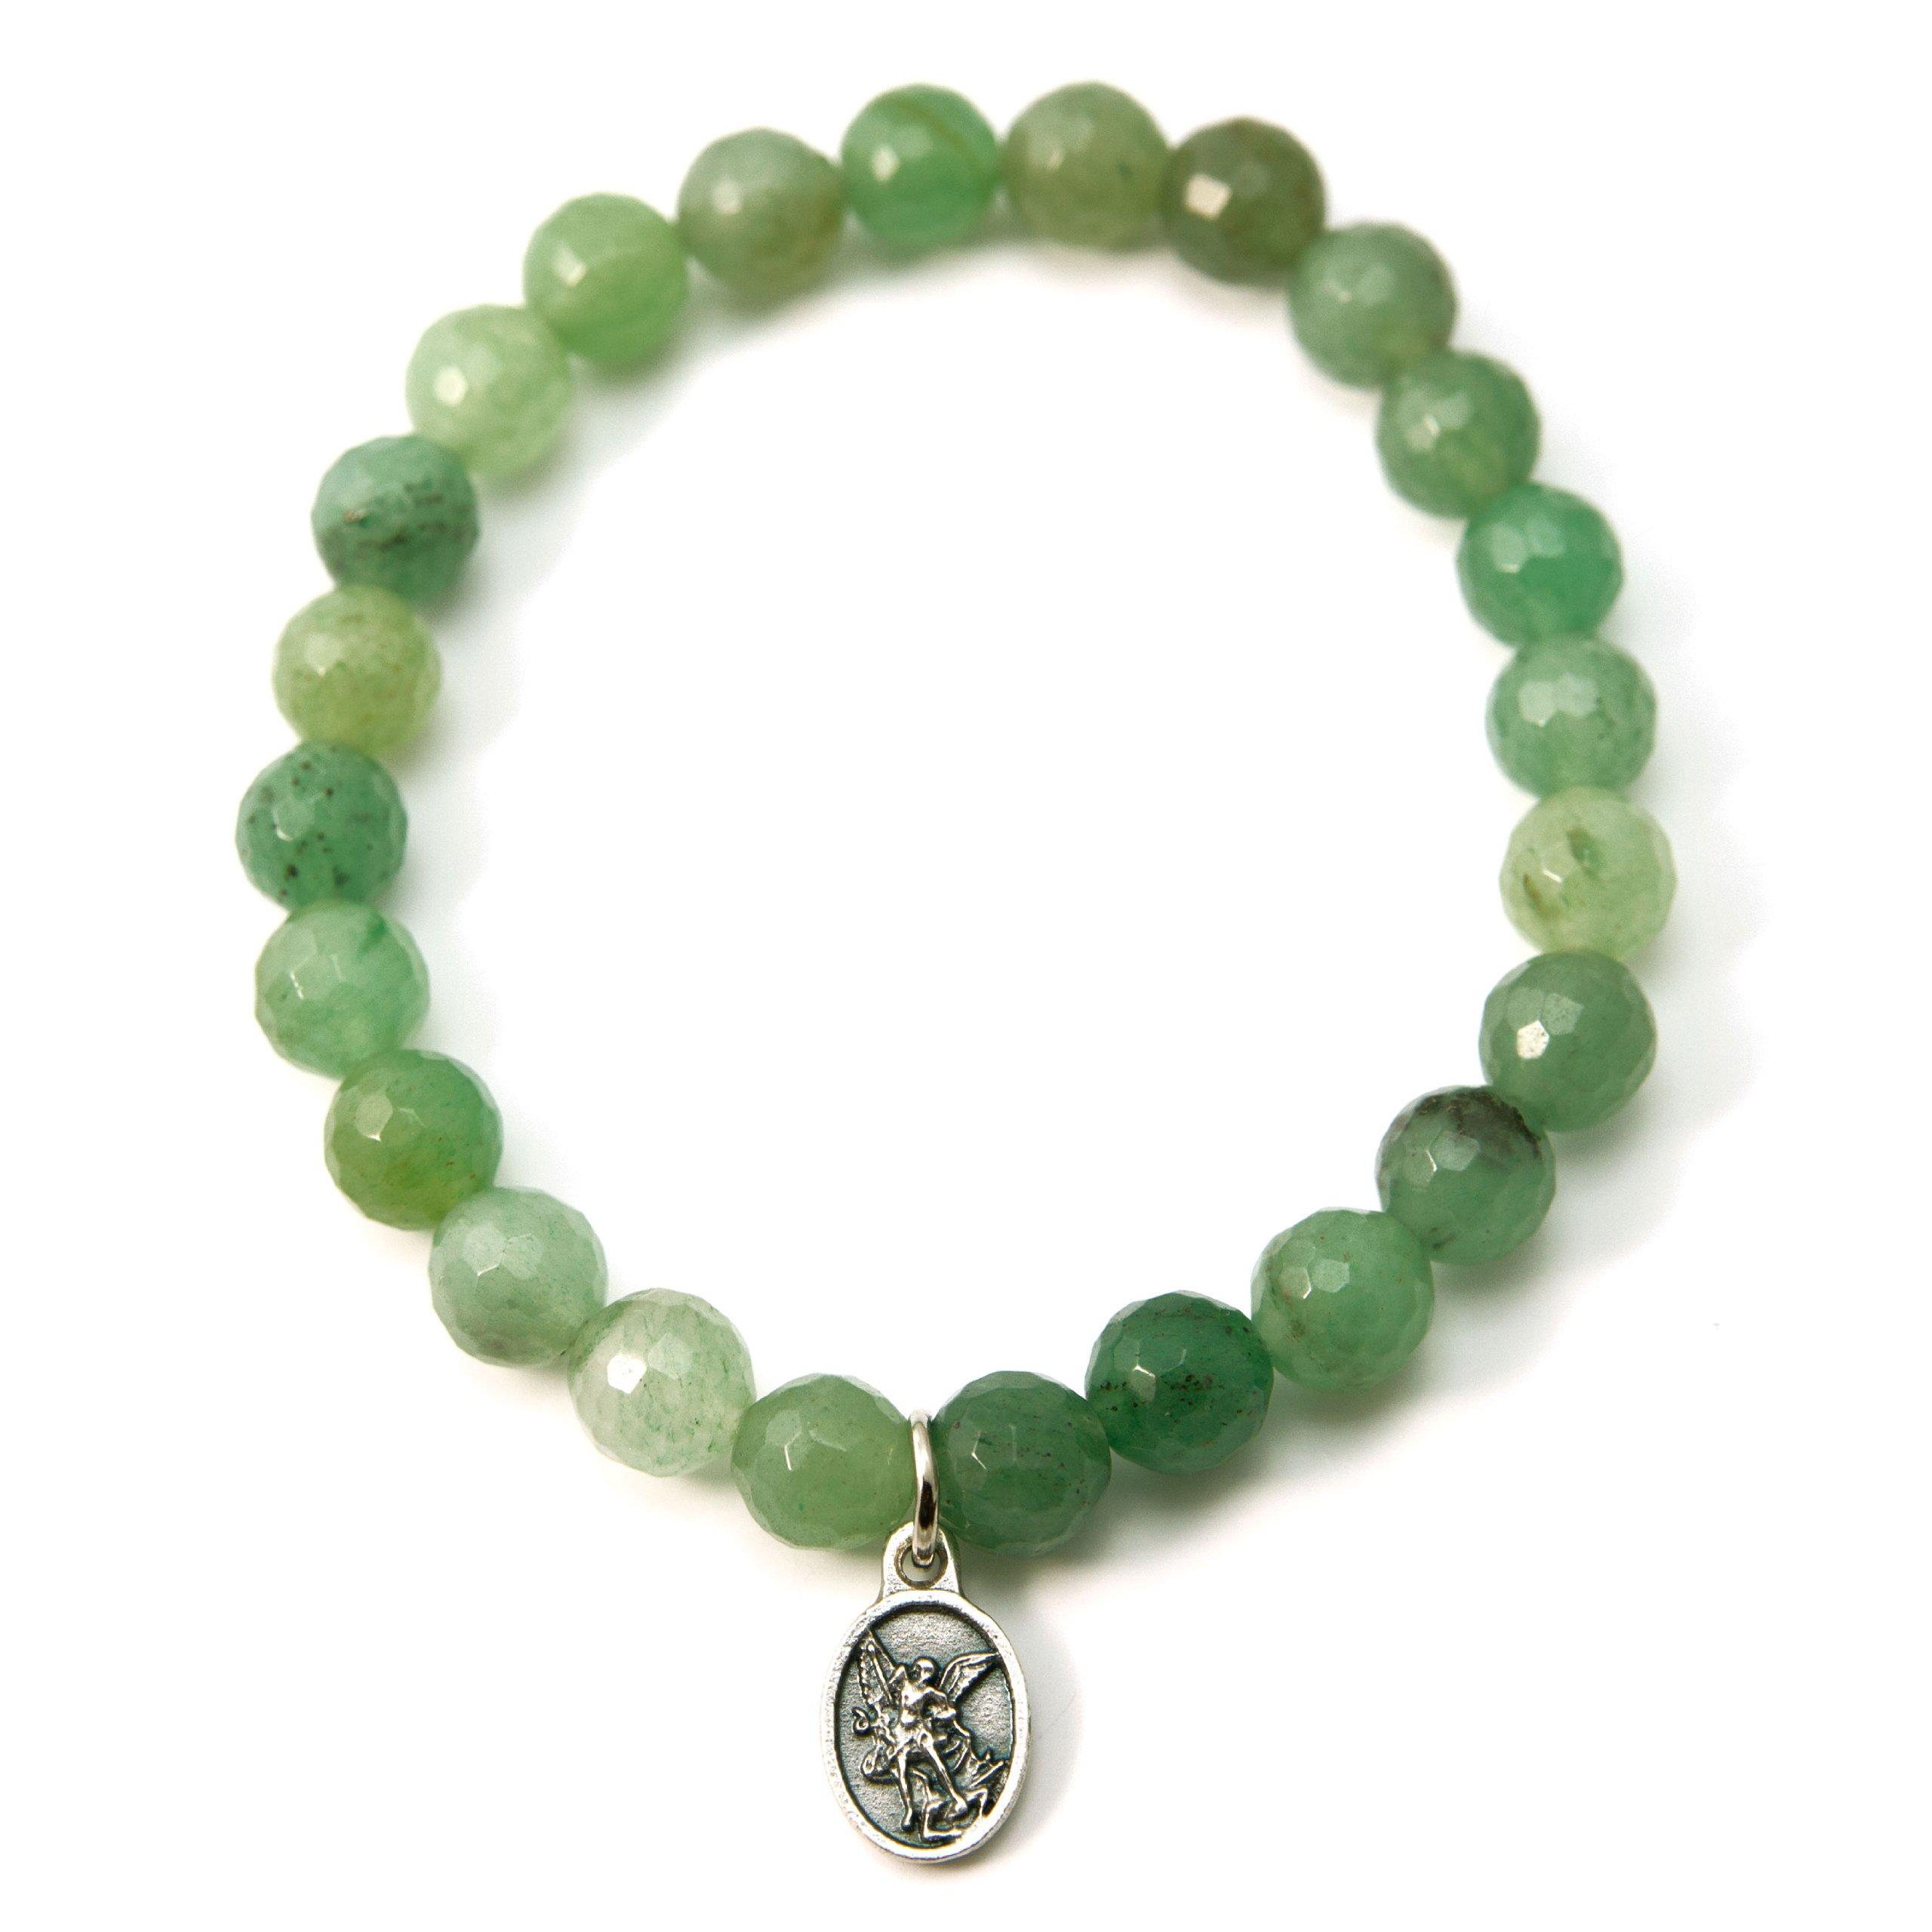 Silver Inches Christian Bracelet Saint Michael Protector Green Aventurine 6.5'' Stretch Bracelet